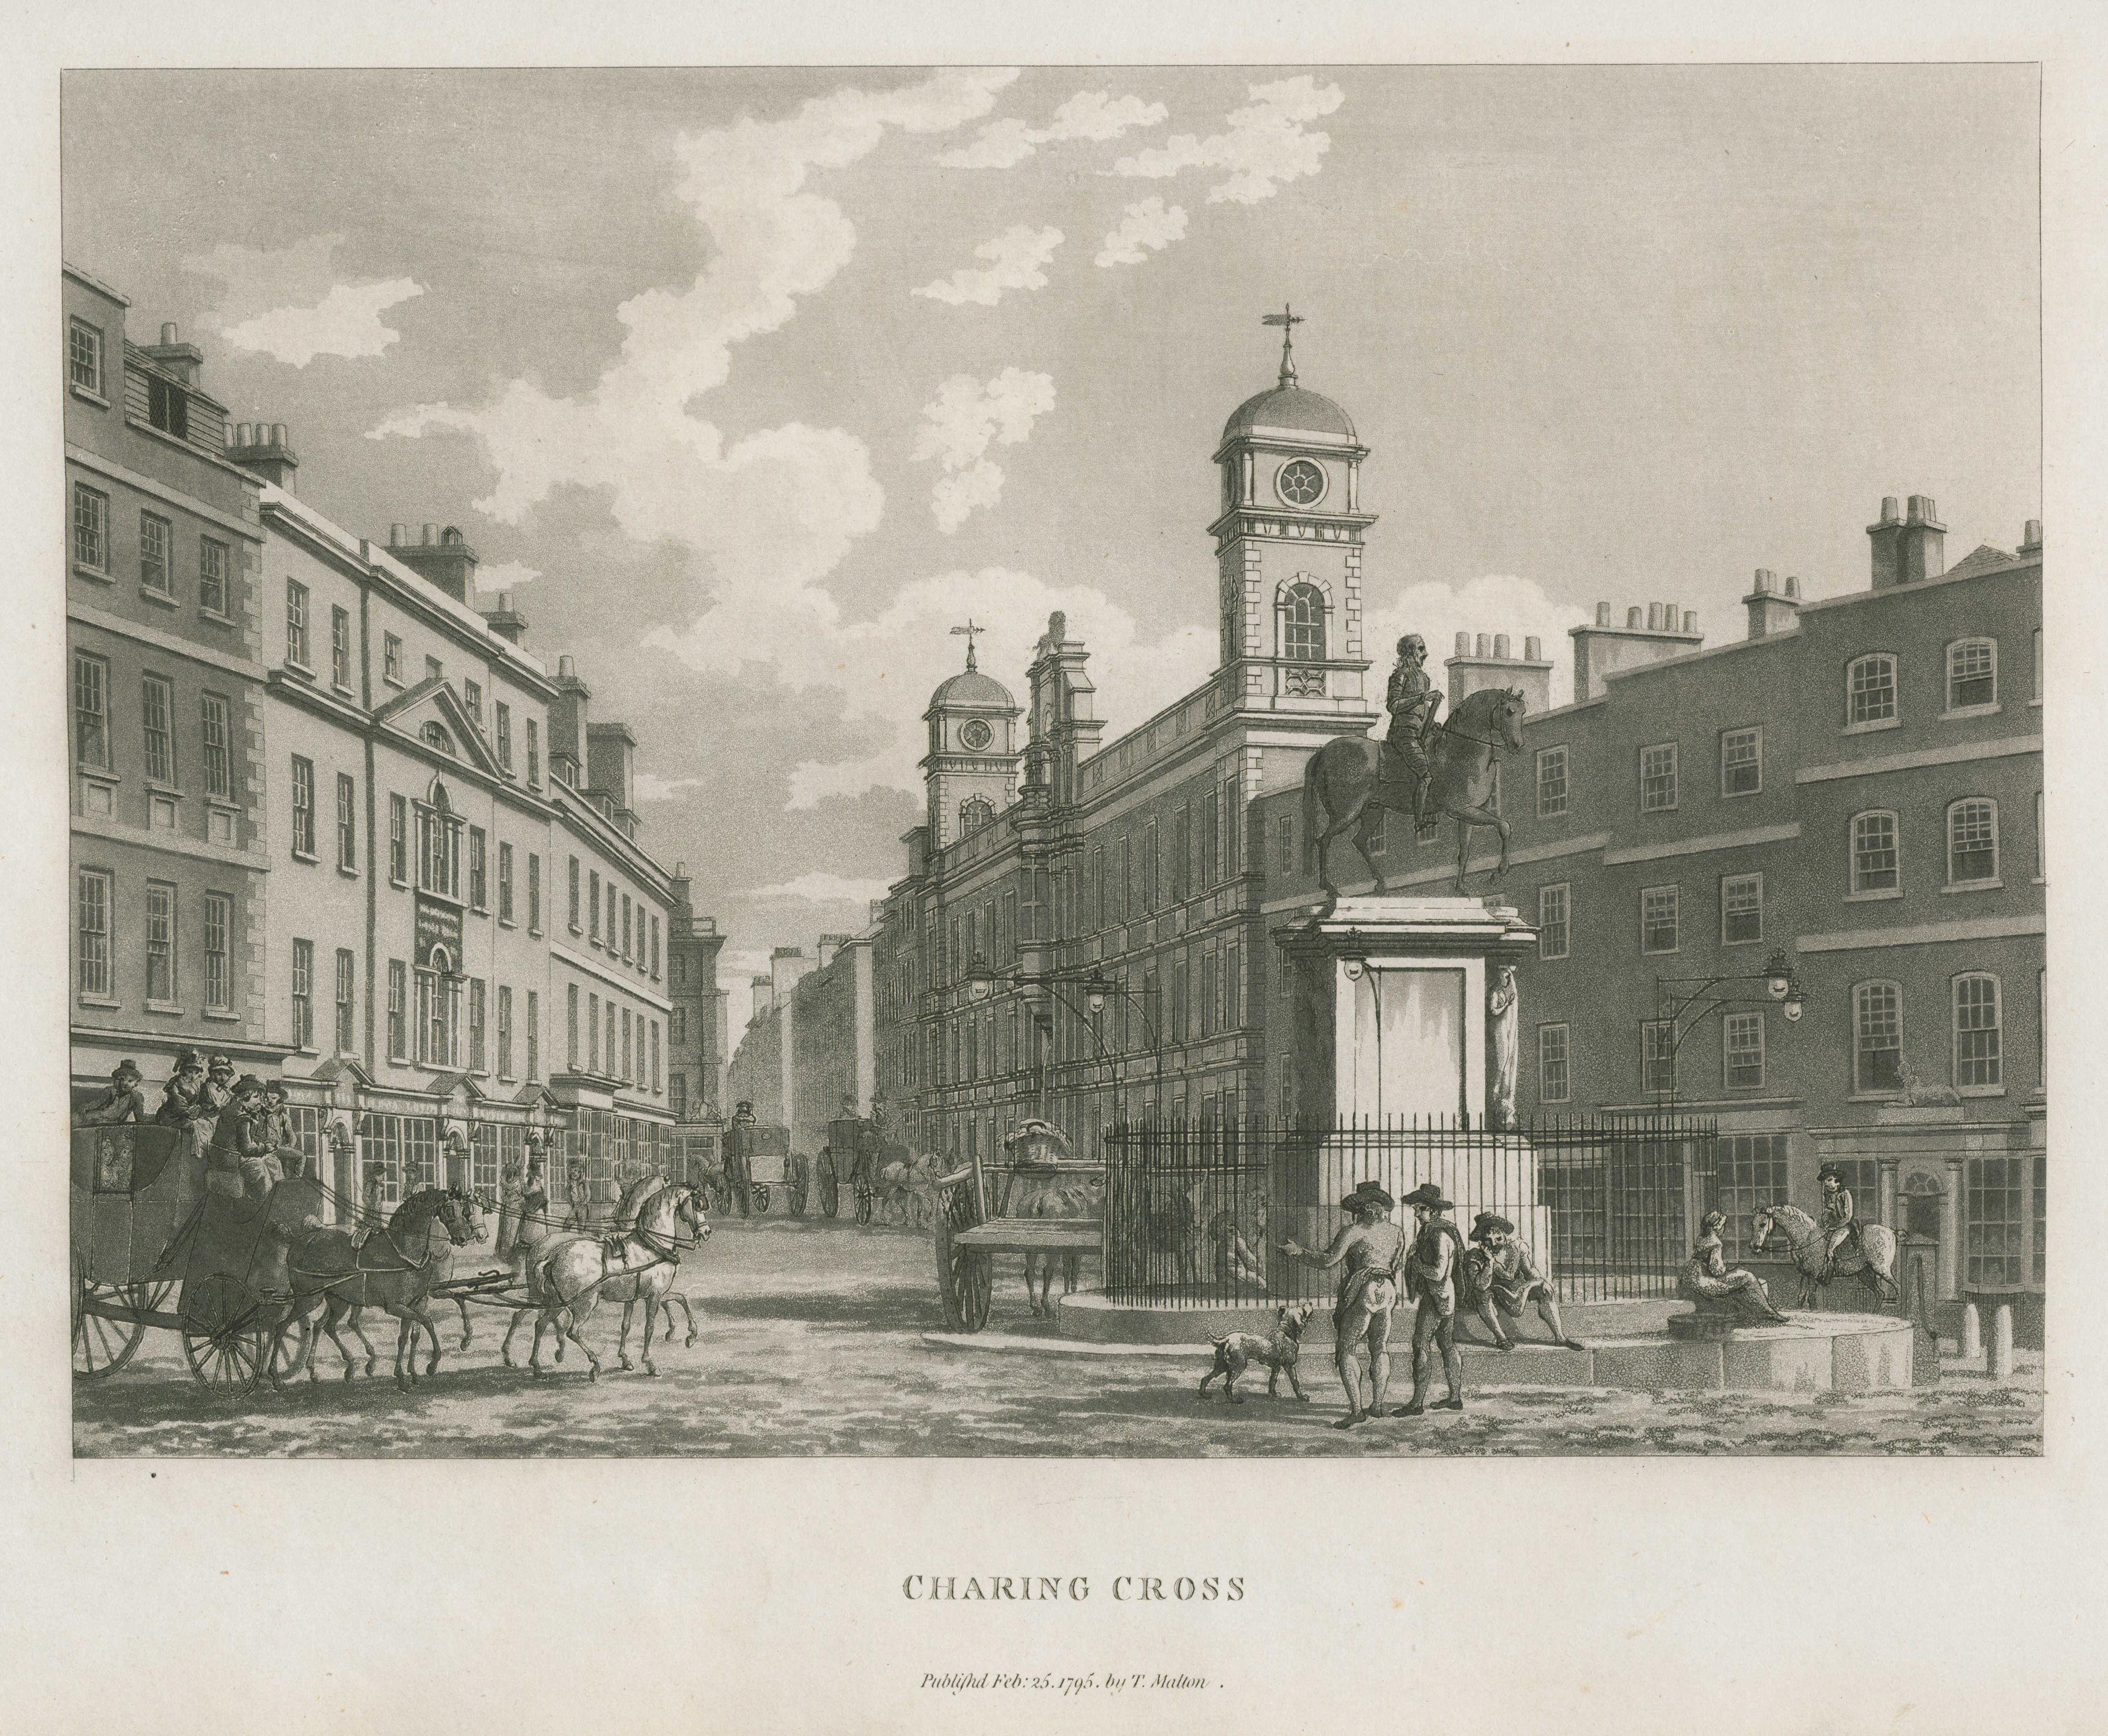 019 - Malton - Charing Cross